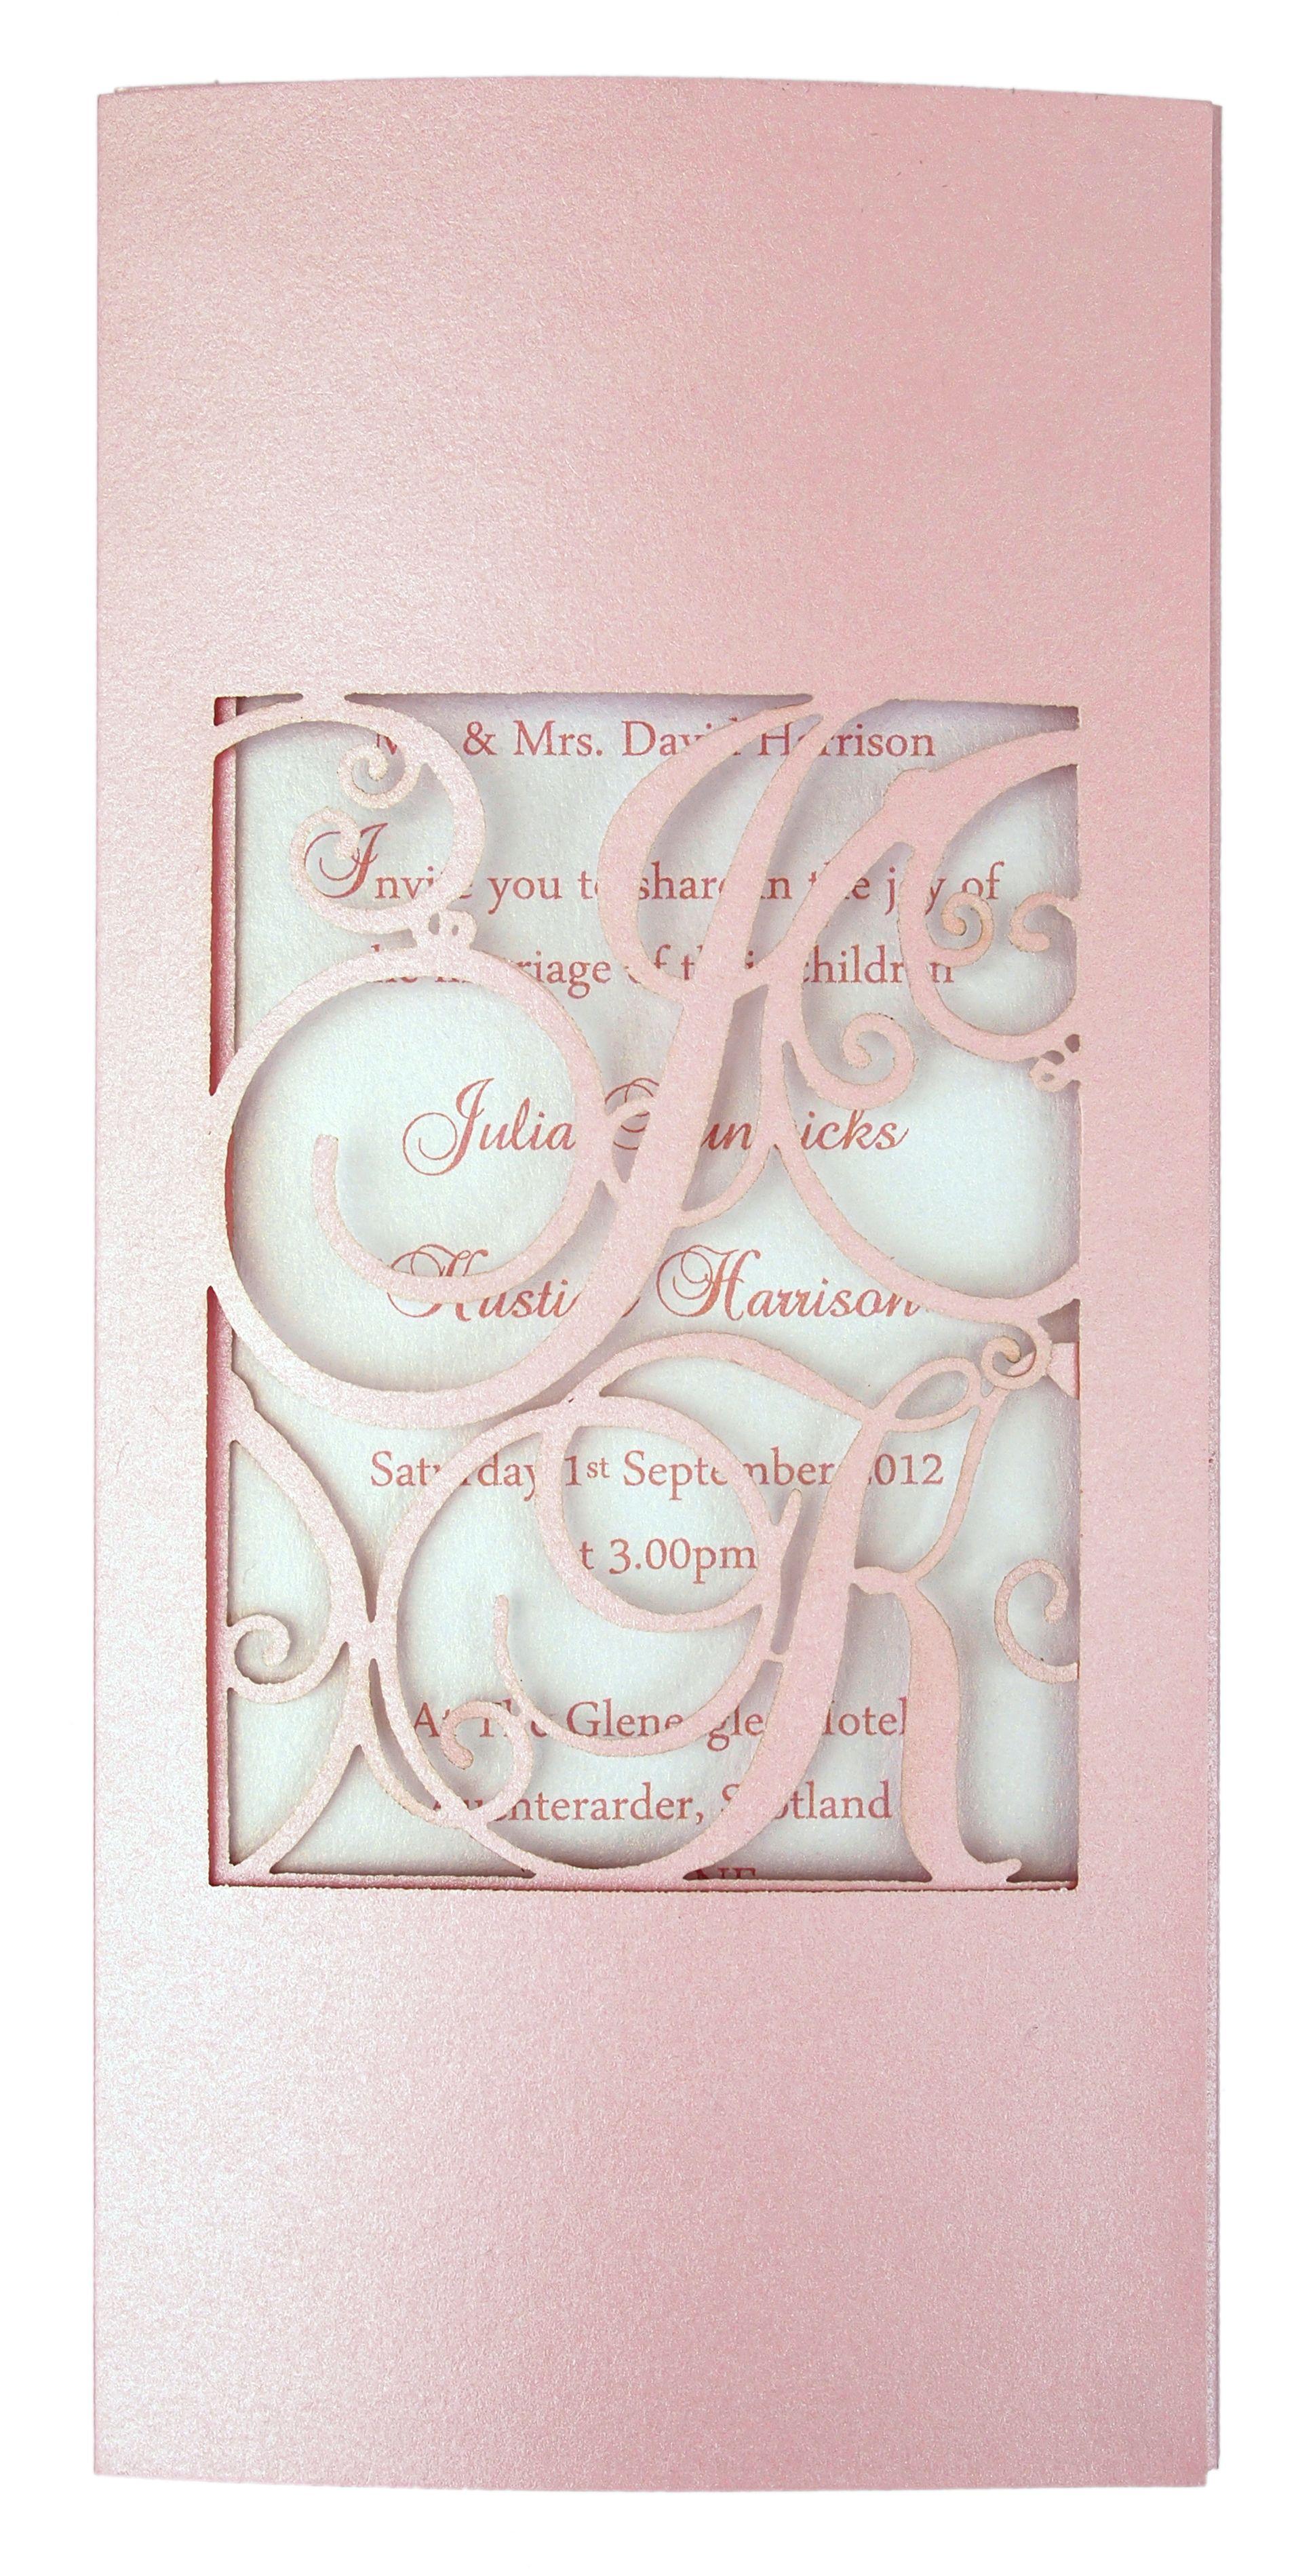 Monogram laser-cut invitations in pink www.intricatecreations.co.uk